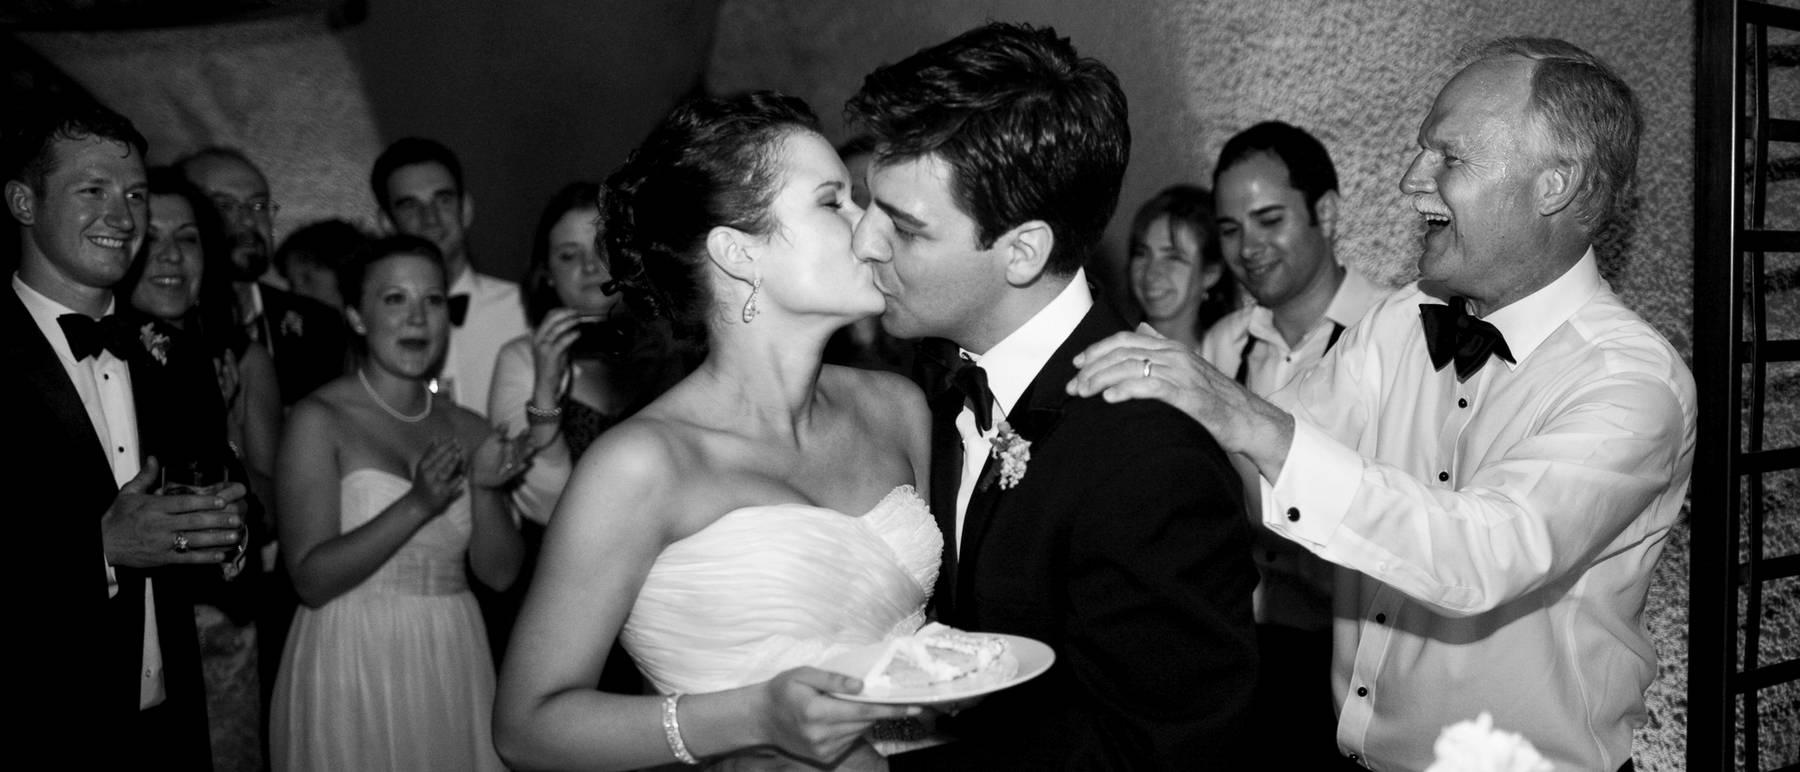 johnandjoseph-wedding-photographer-hz-slider-246